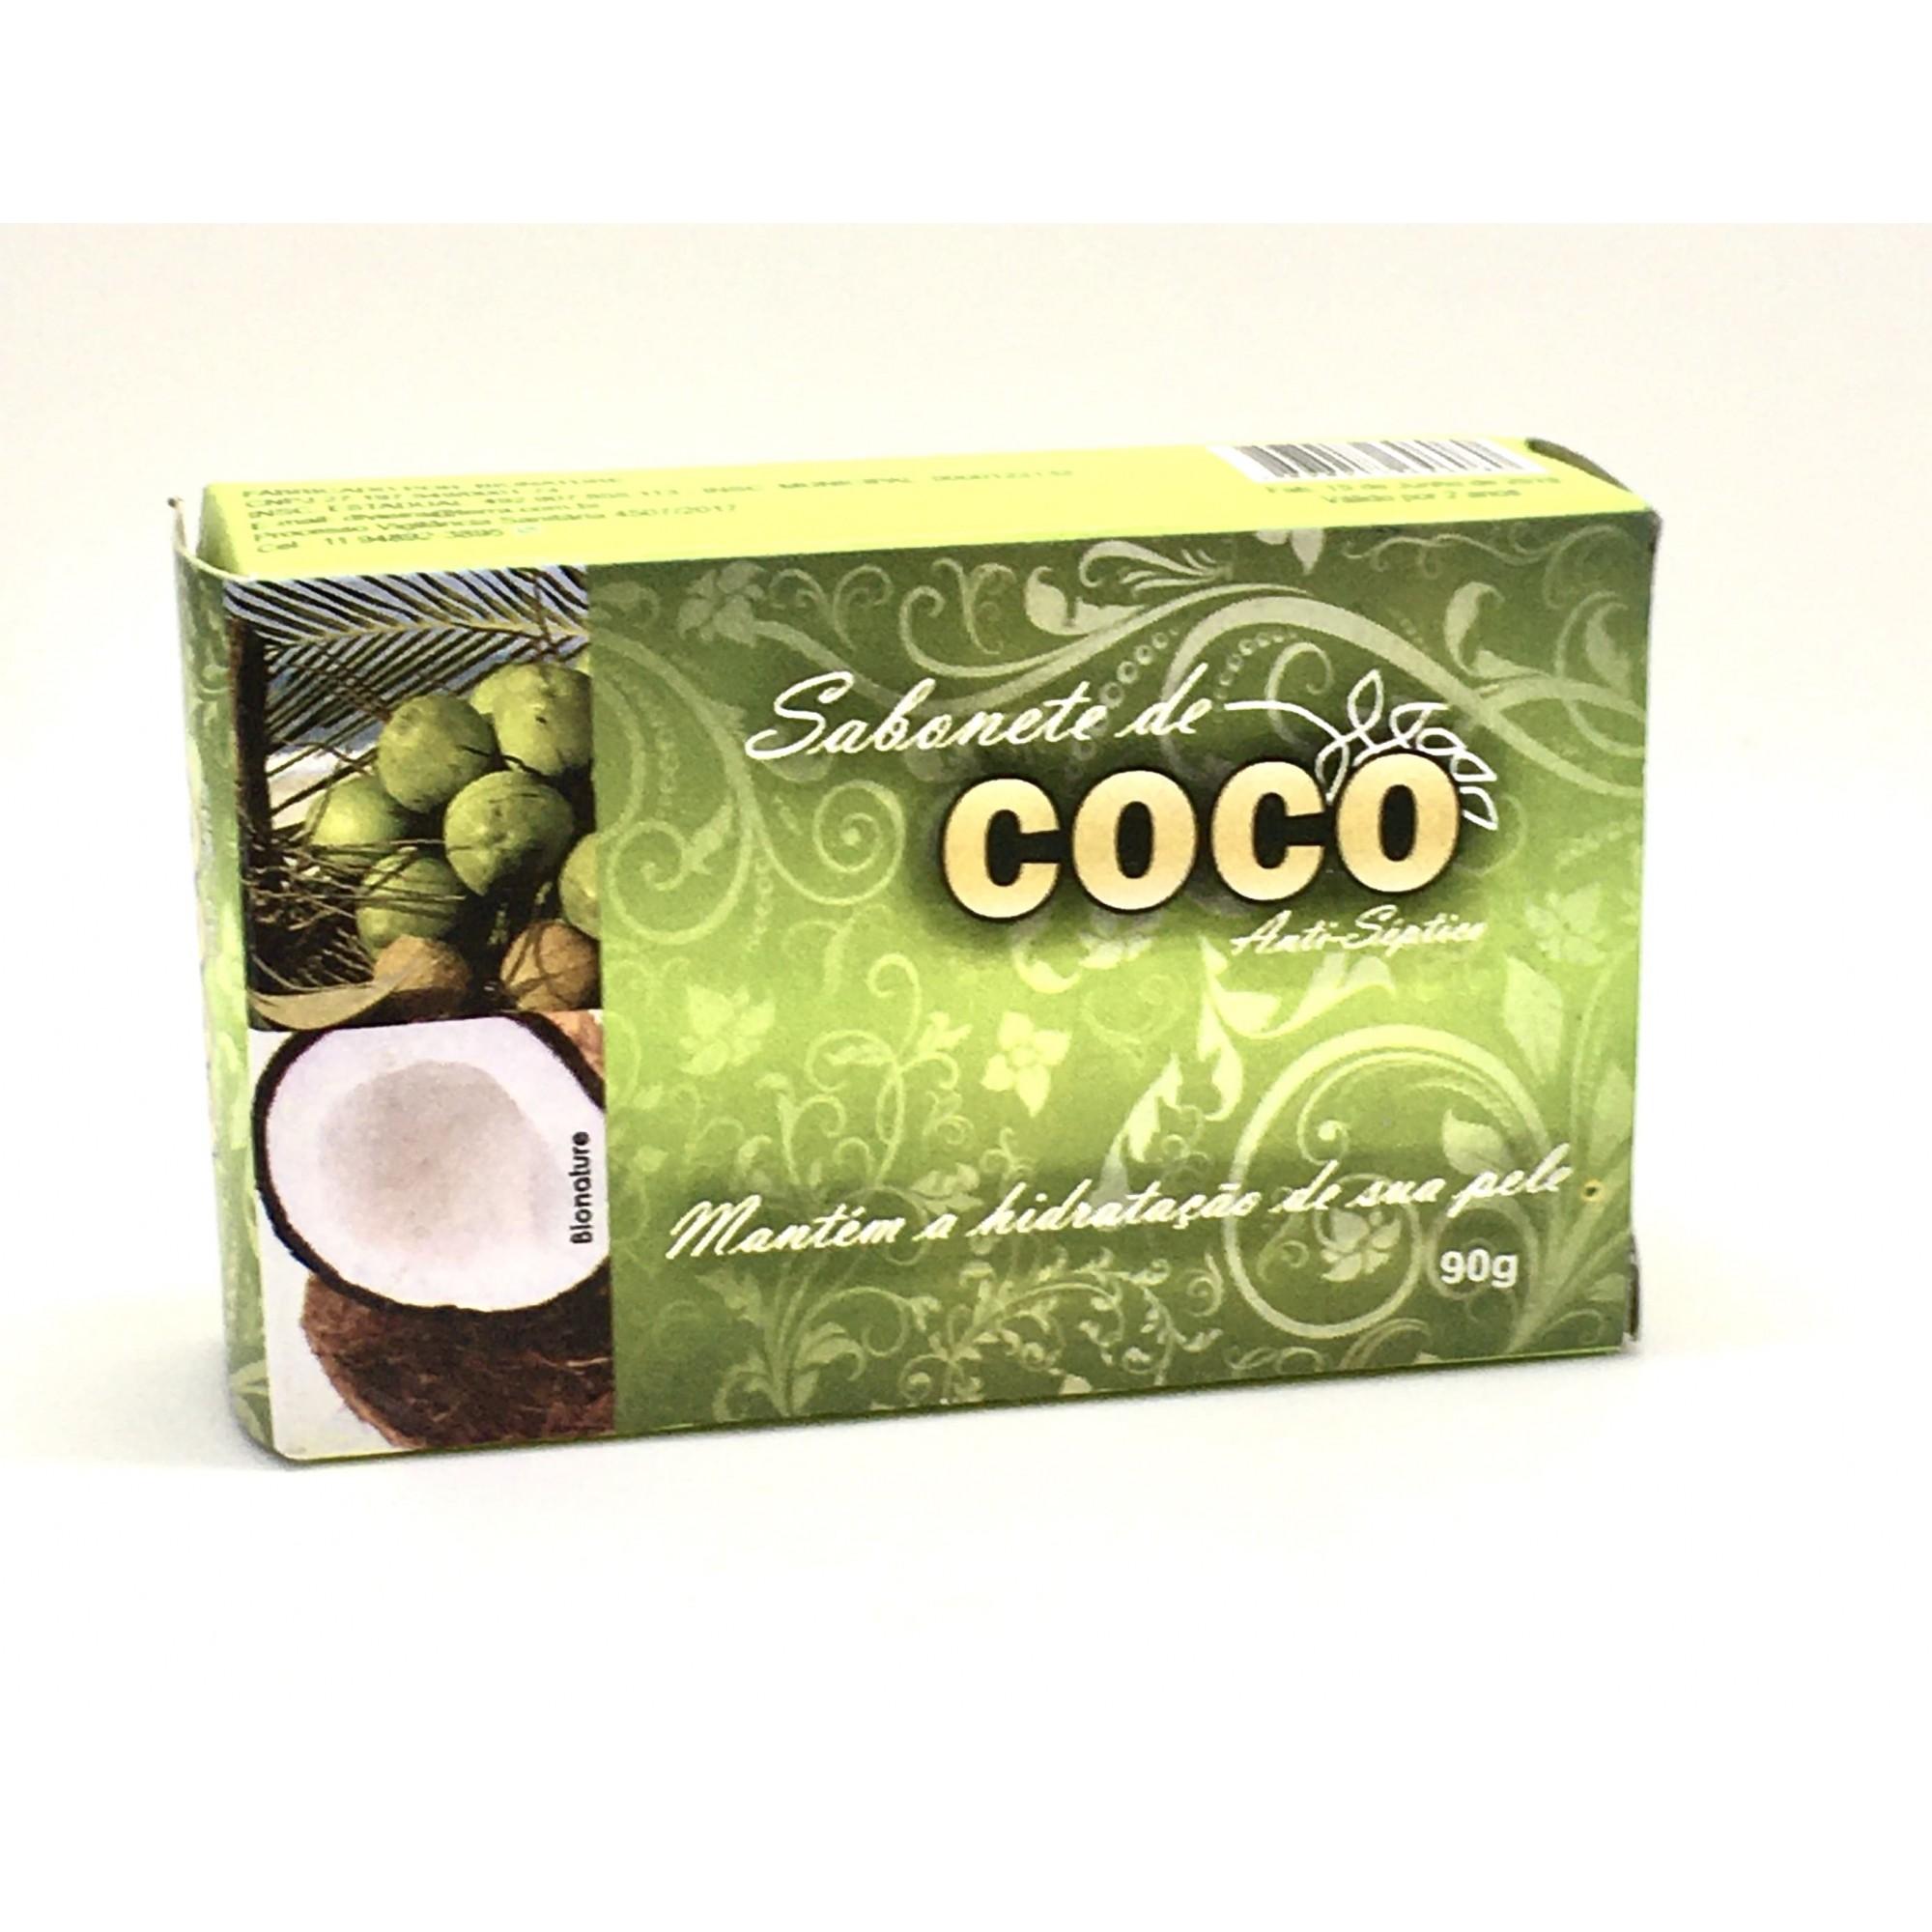 Sabonete de Coco  - Casa do Mel